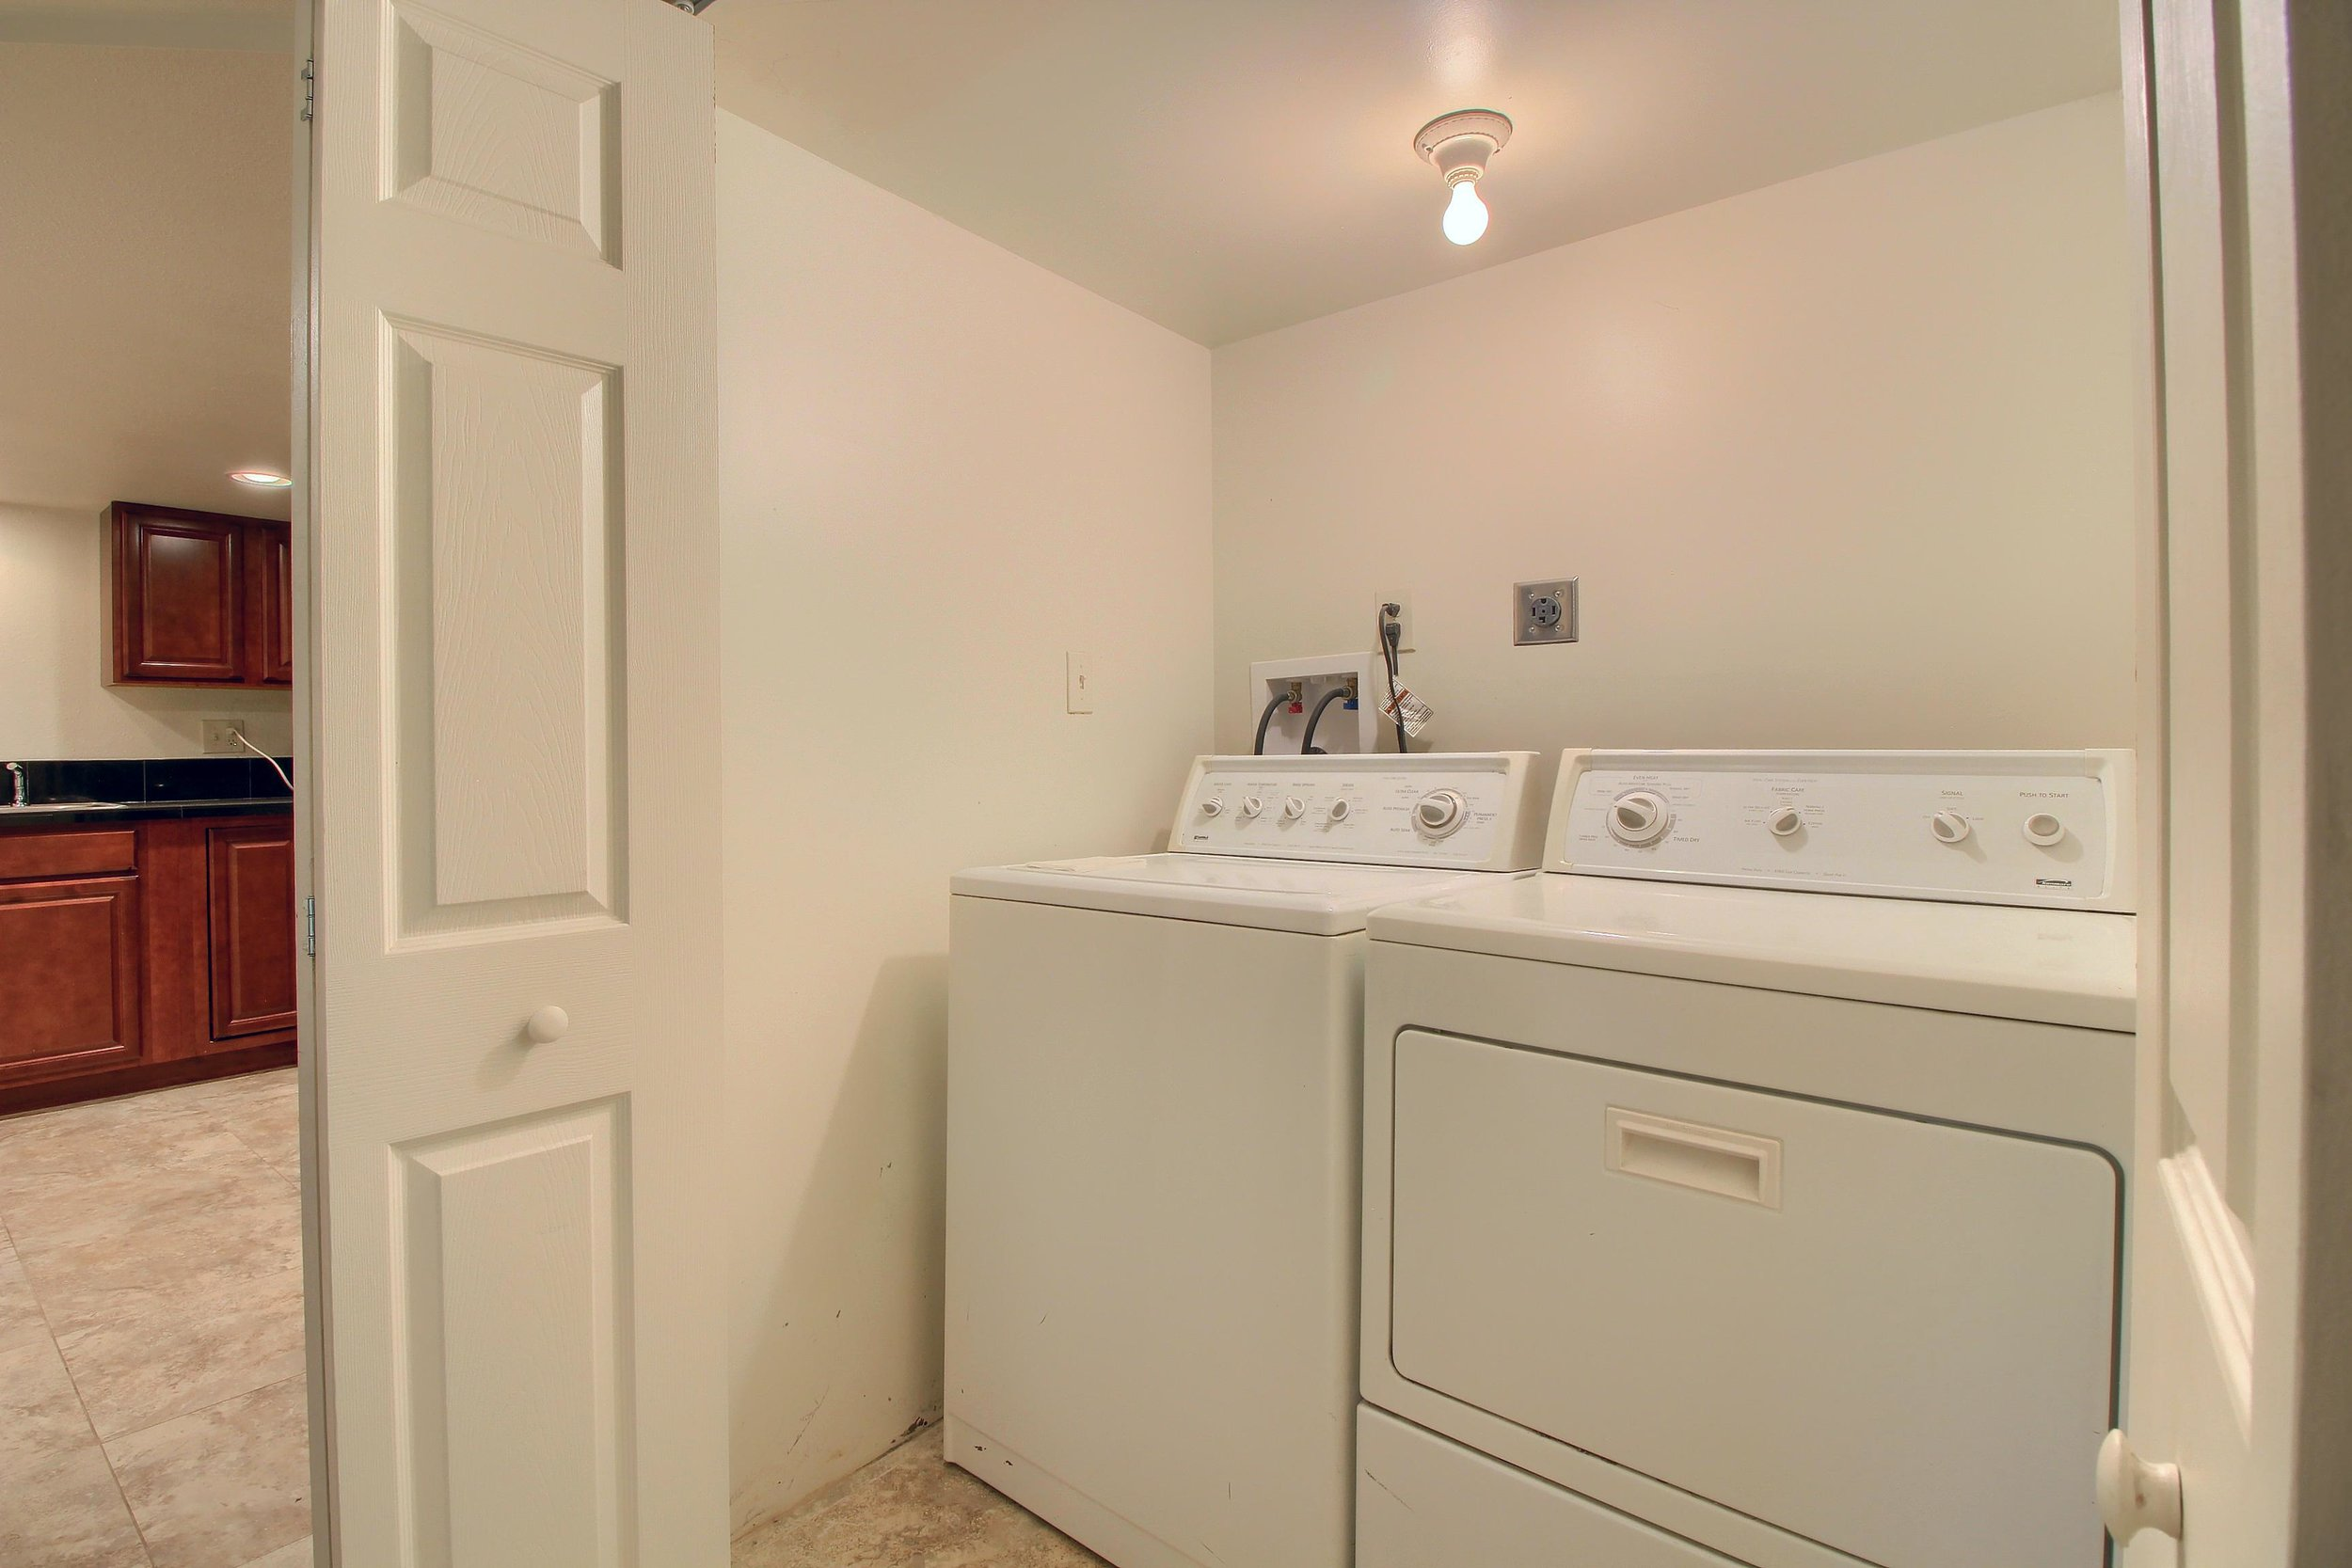 13_Laundry_Room_IMG_1146.JPG